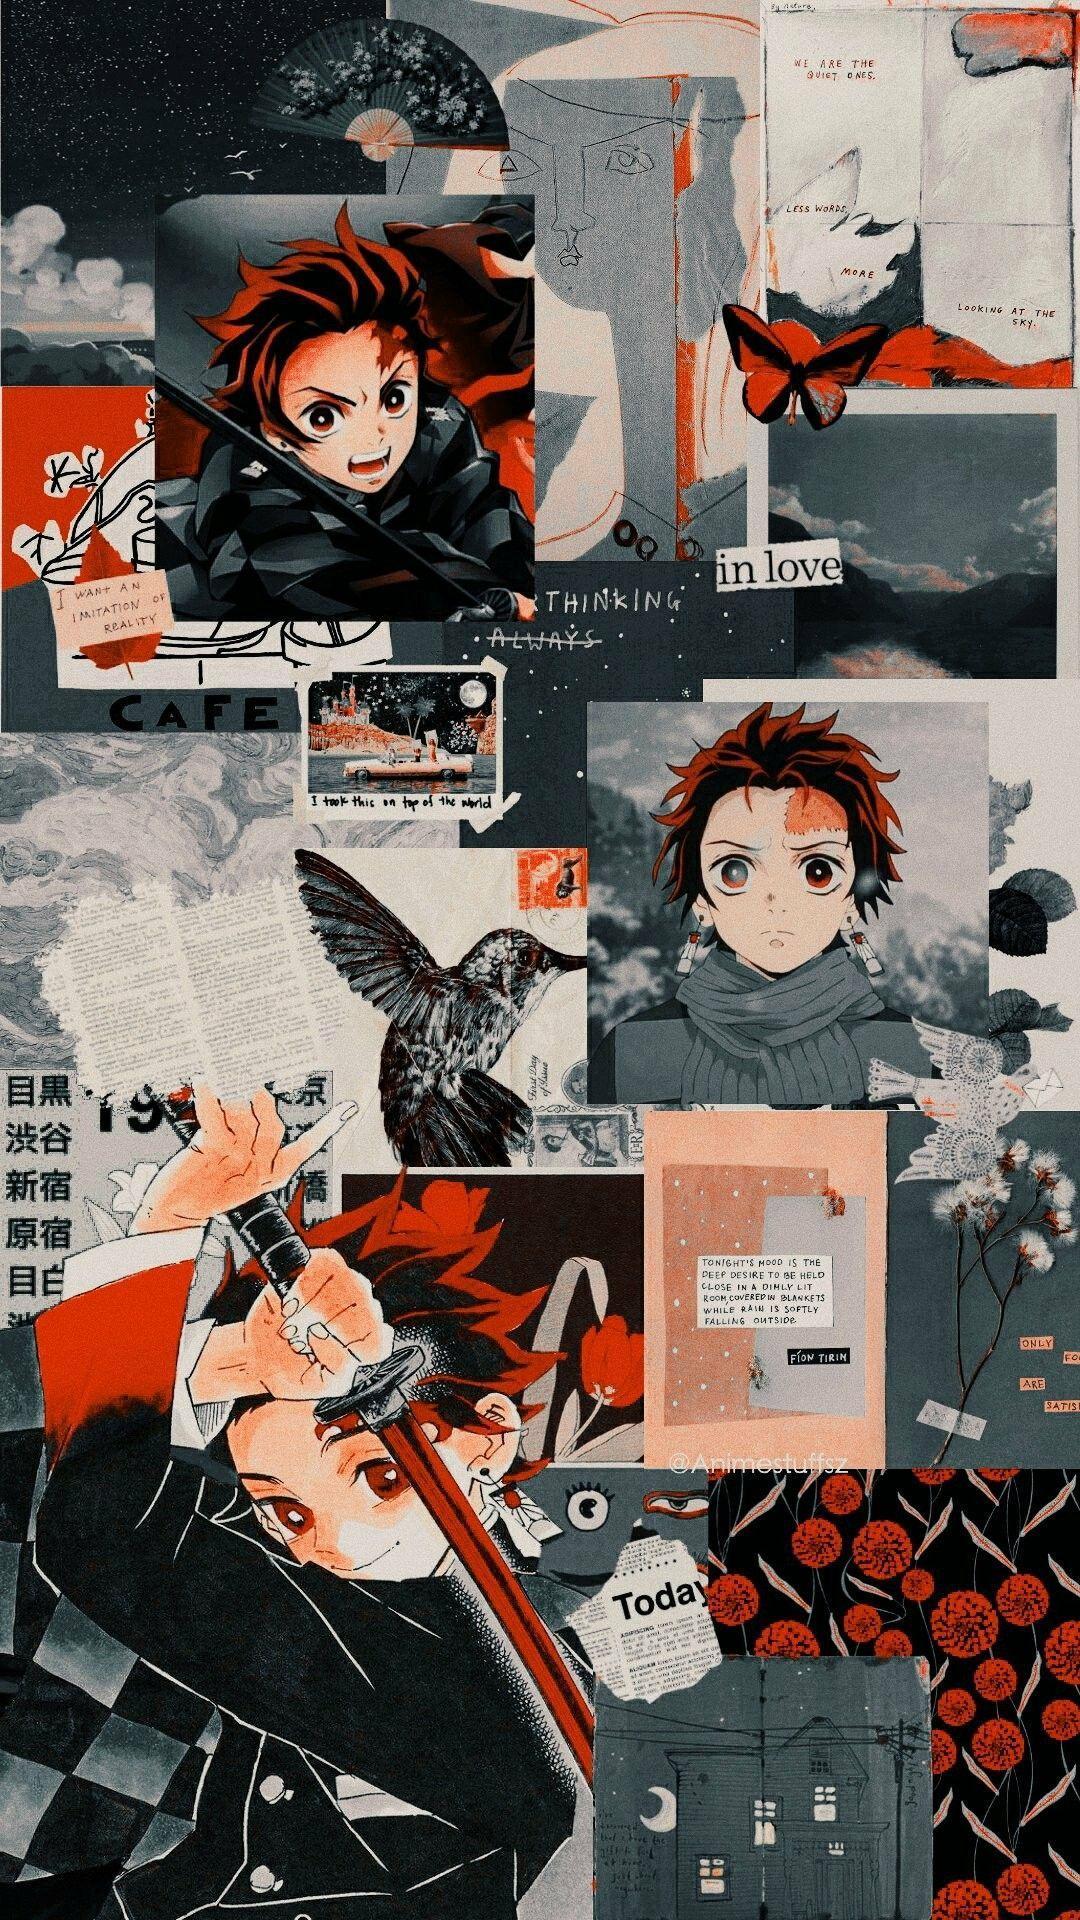 Demon Slayer Aesthetic Wallpapers - Top Free Demon Slayer ...